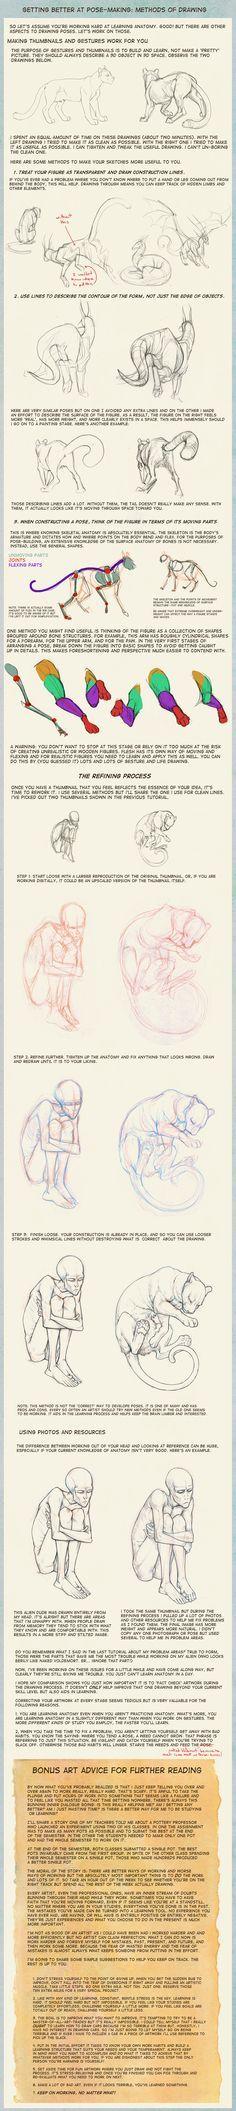 Poses: methods of drawing by hibbary.deviantart.com on @deviantART